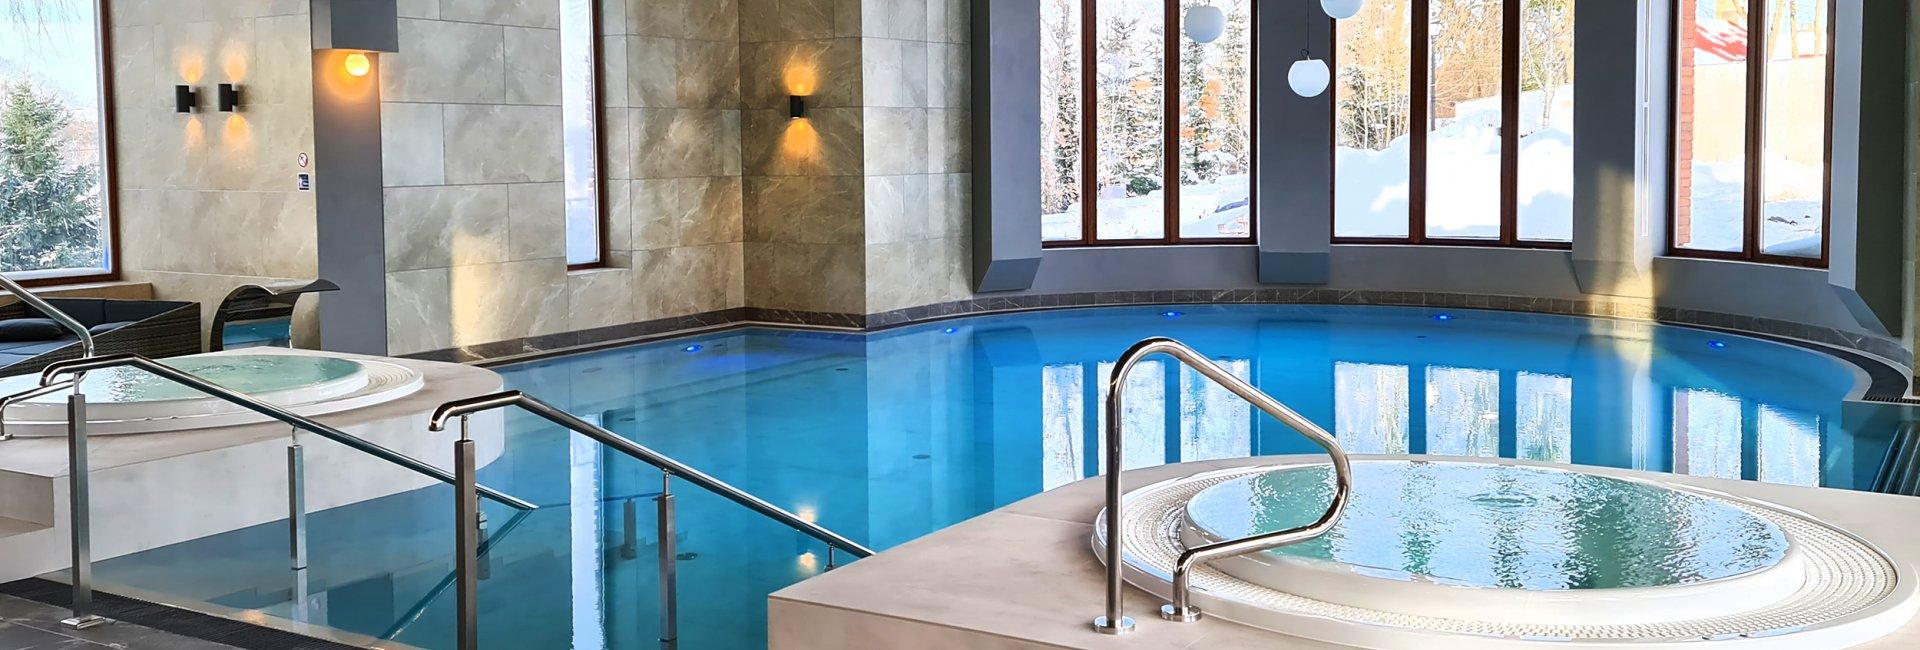 A new, bigger swimming pool